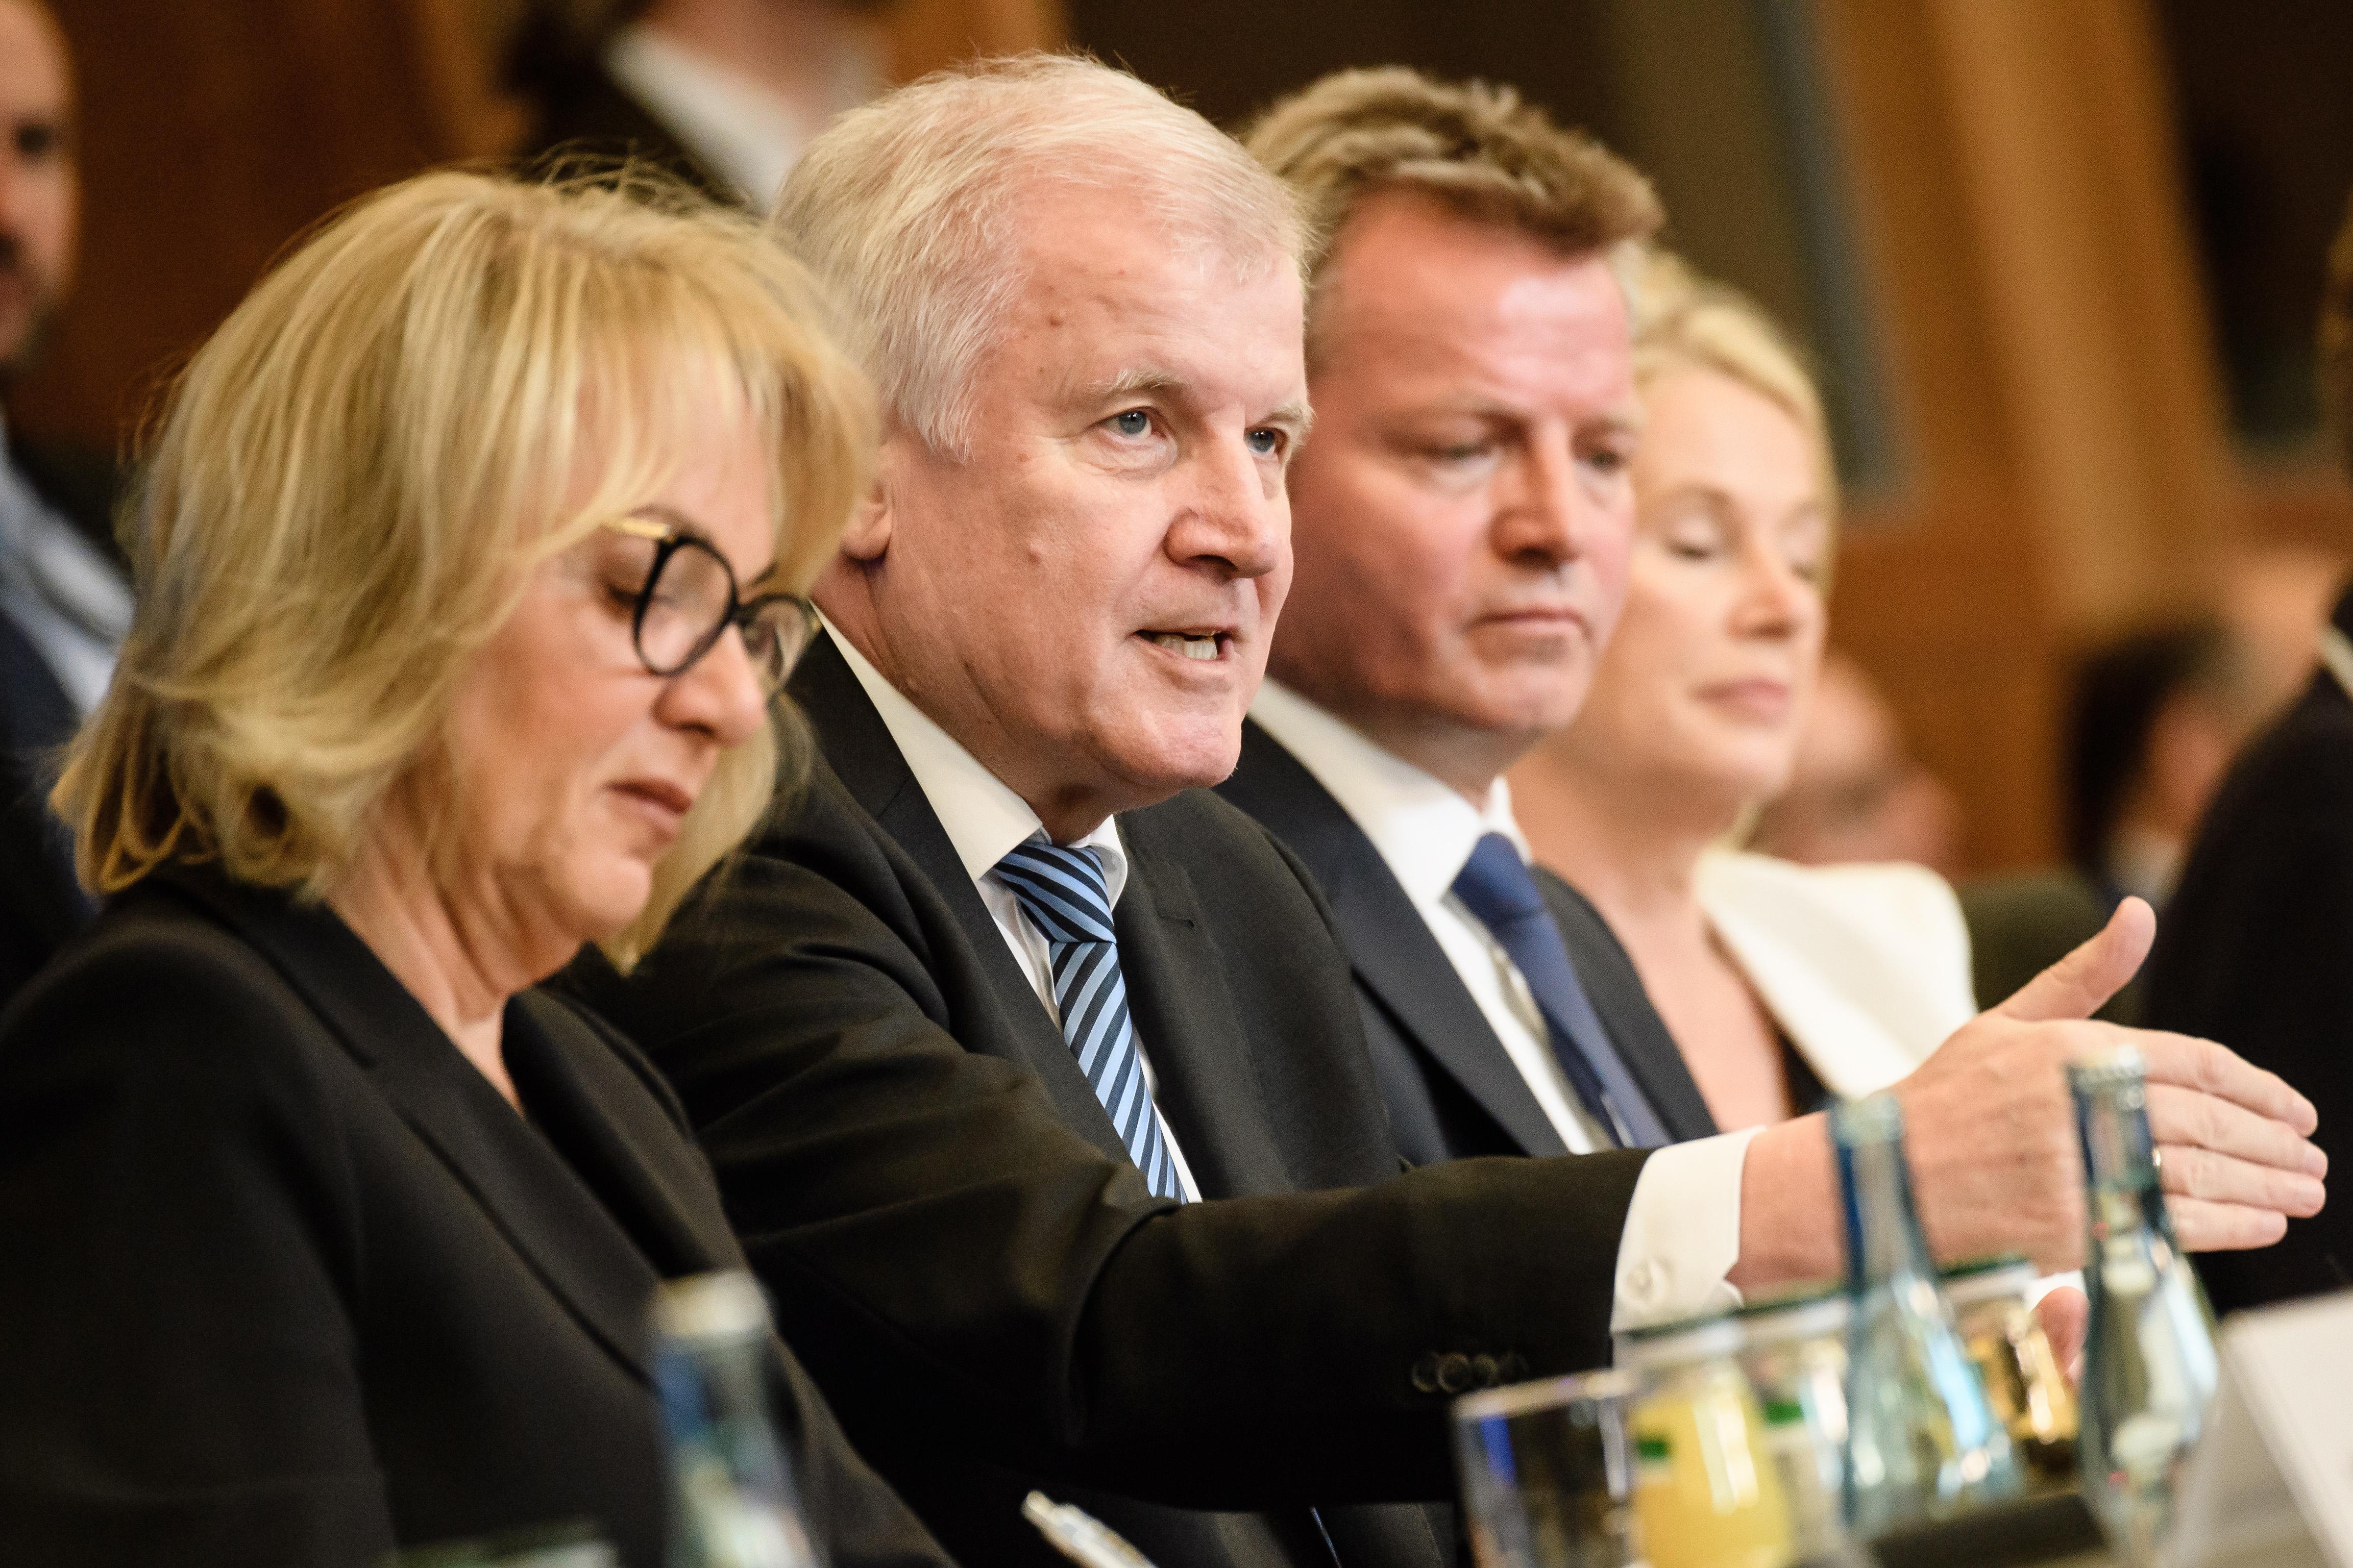 CSU gubi podršku, stranci naudio sukob s Merkel